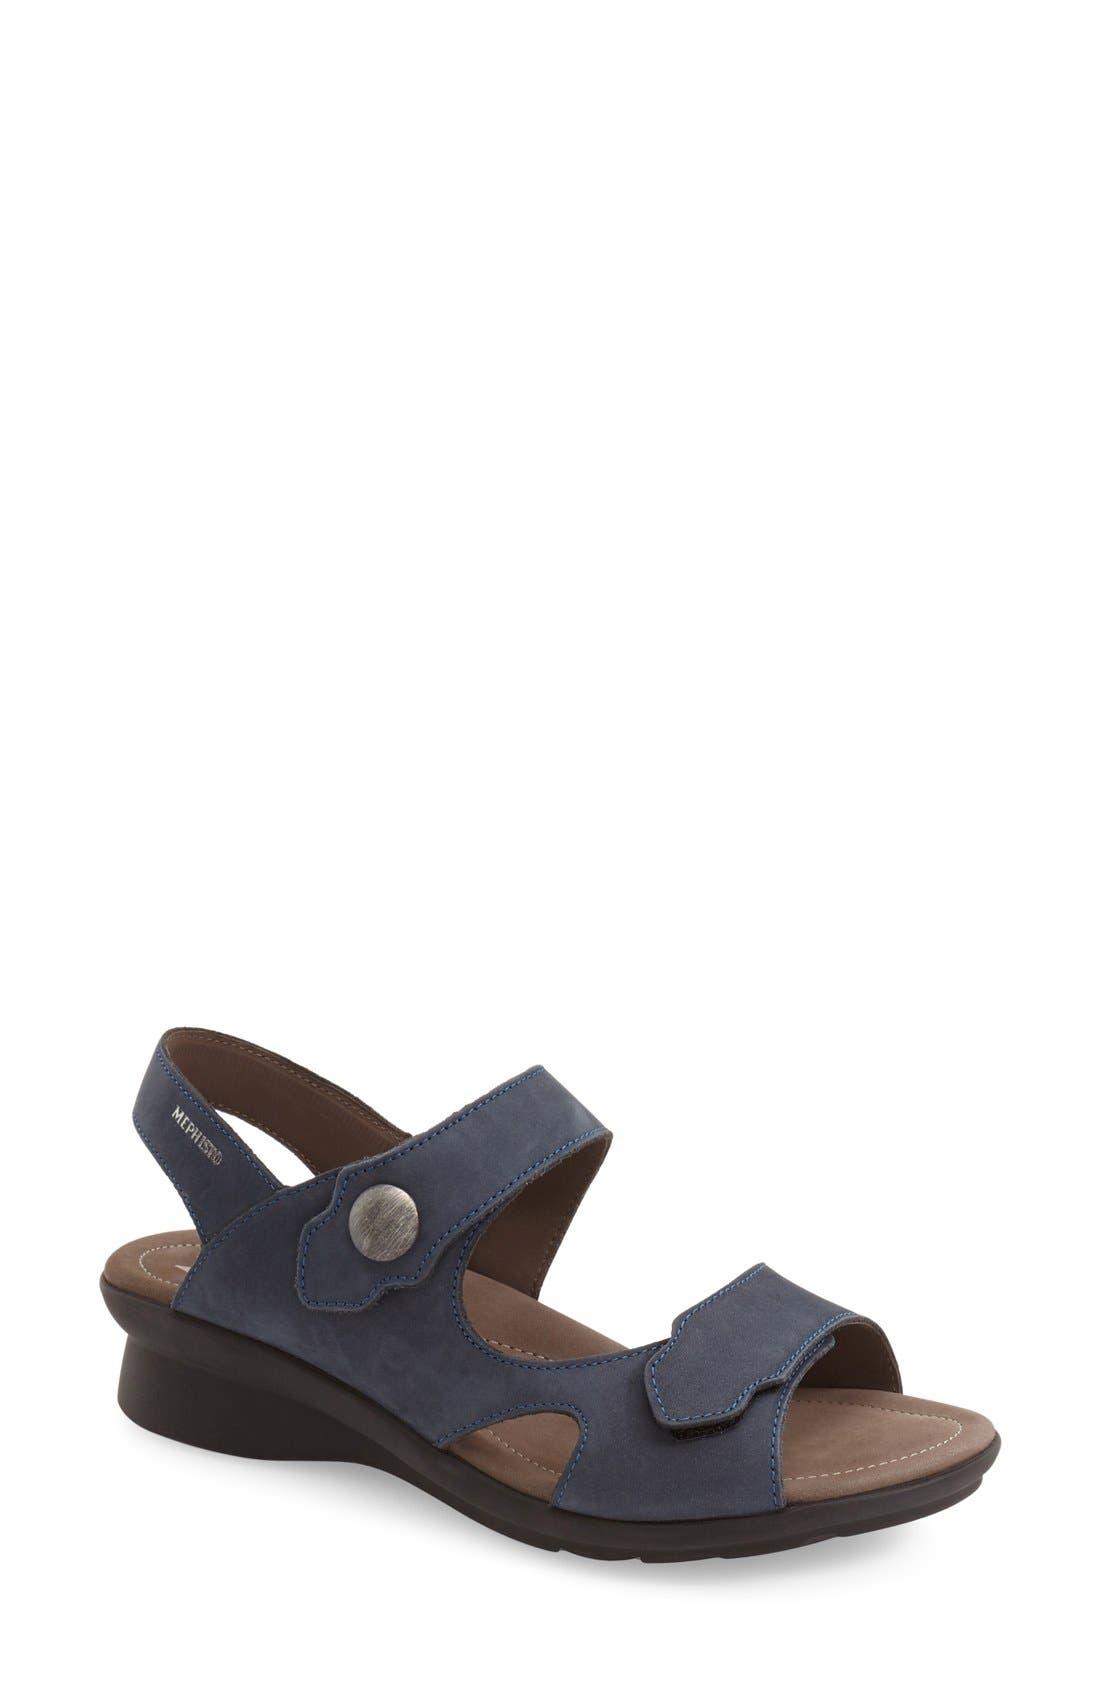 MEPHISTO Prudy Leather Sandal